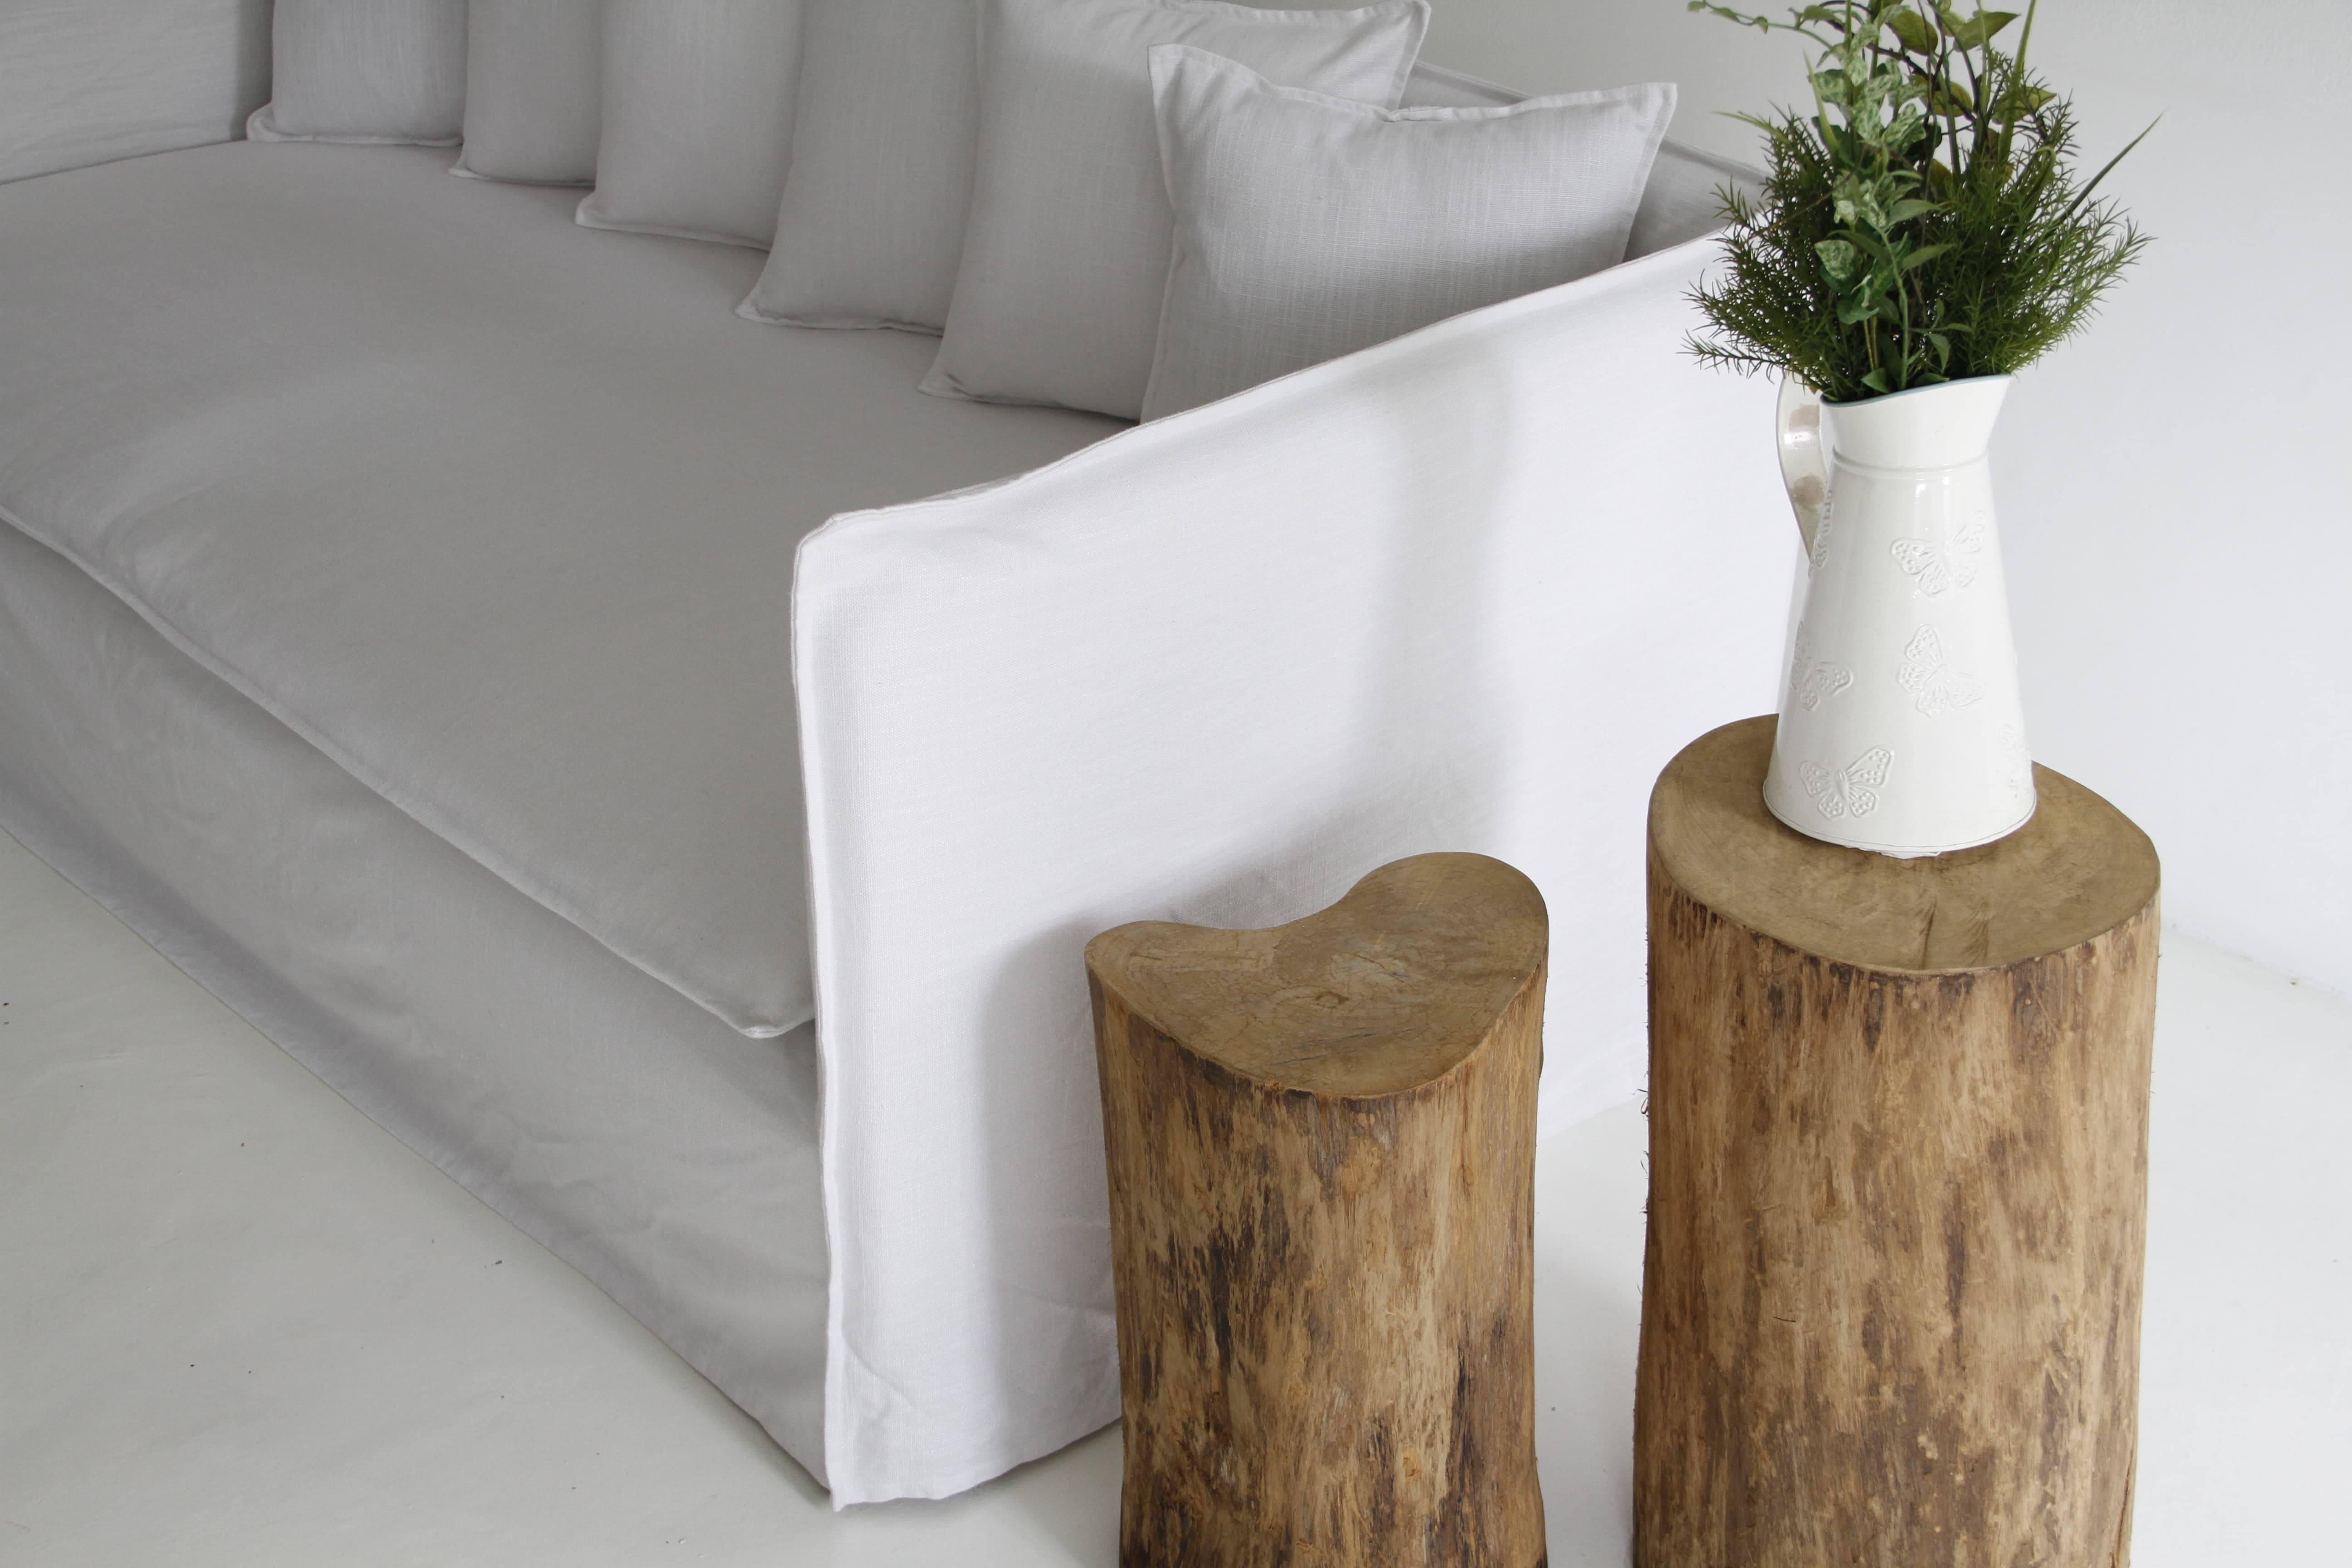 soderhamn ghost sofa covers angled